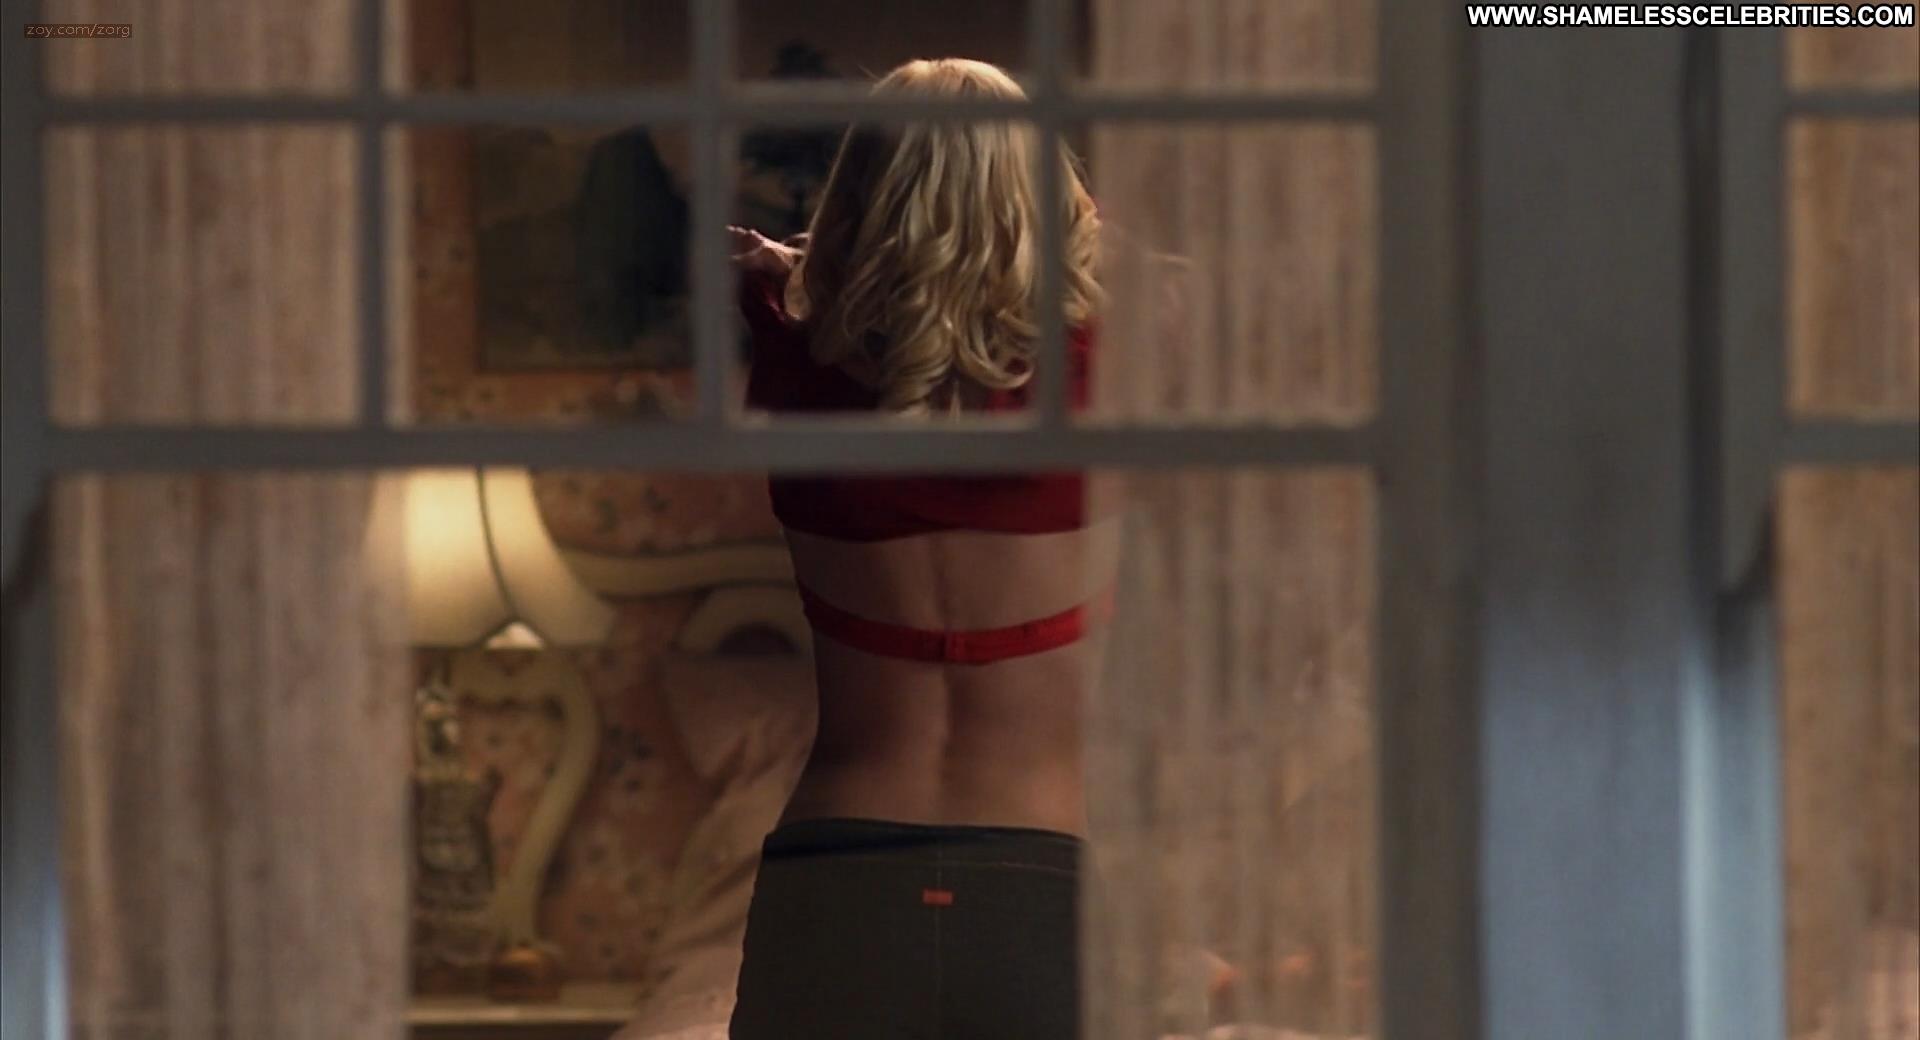 Consider, Elisha cuthbert girl next door nude